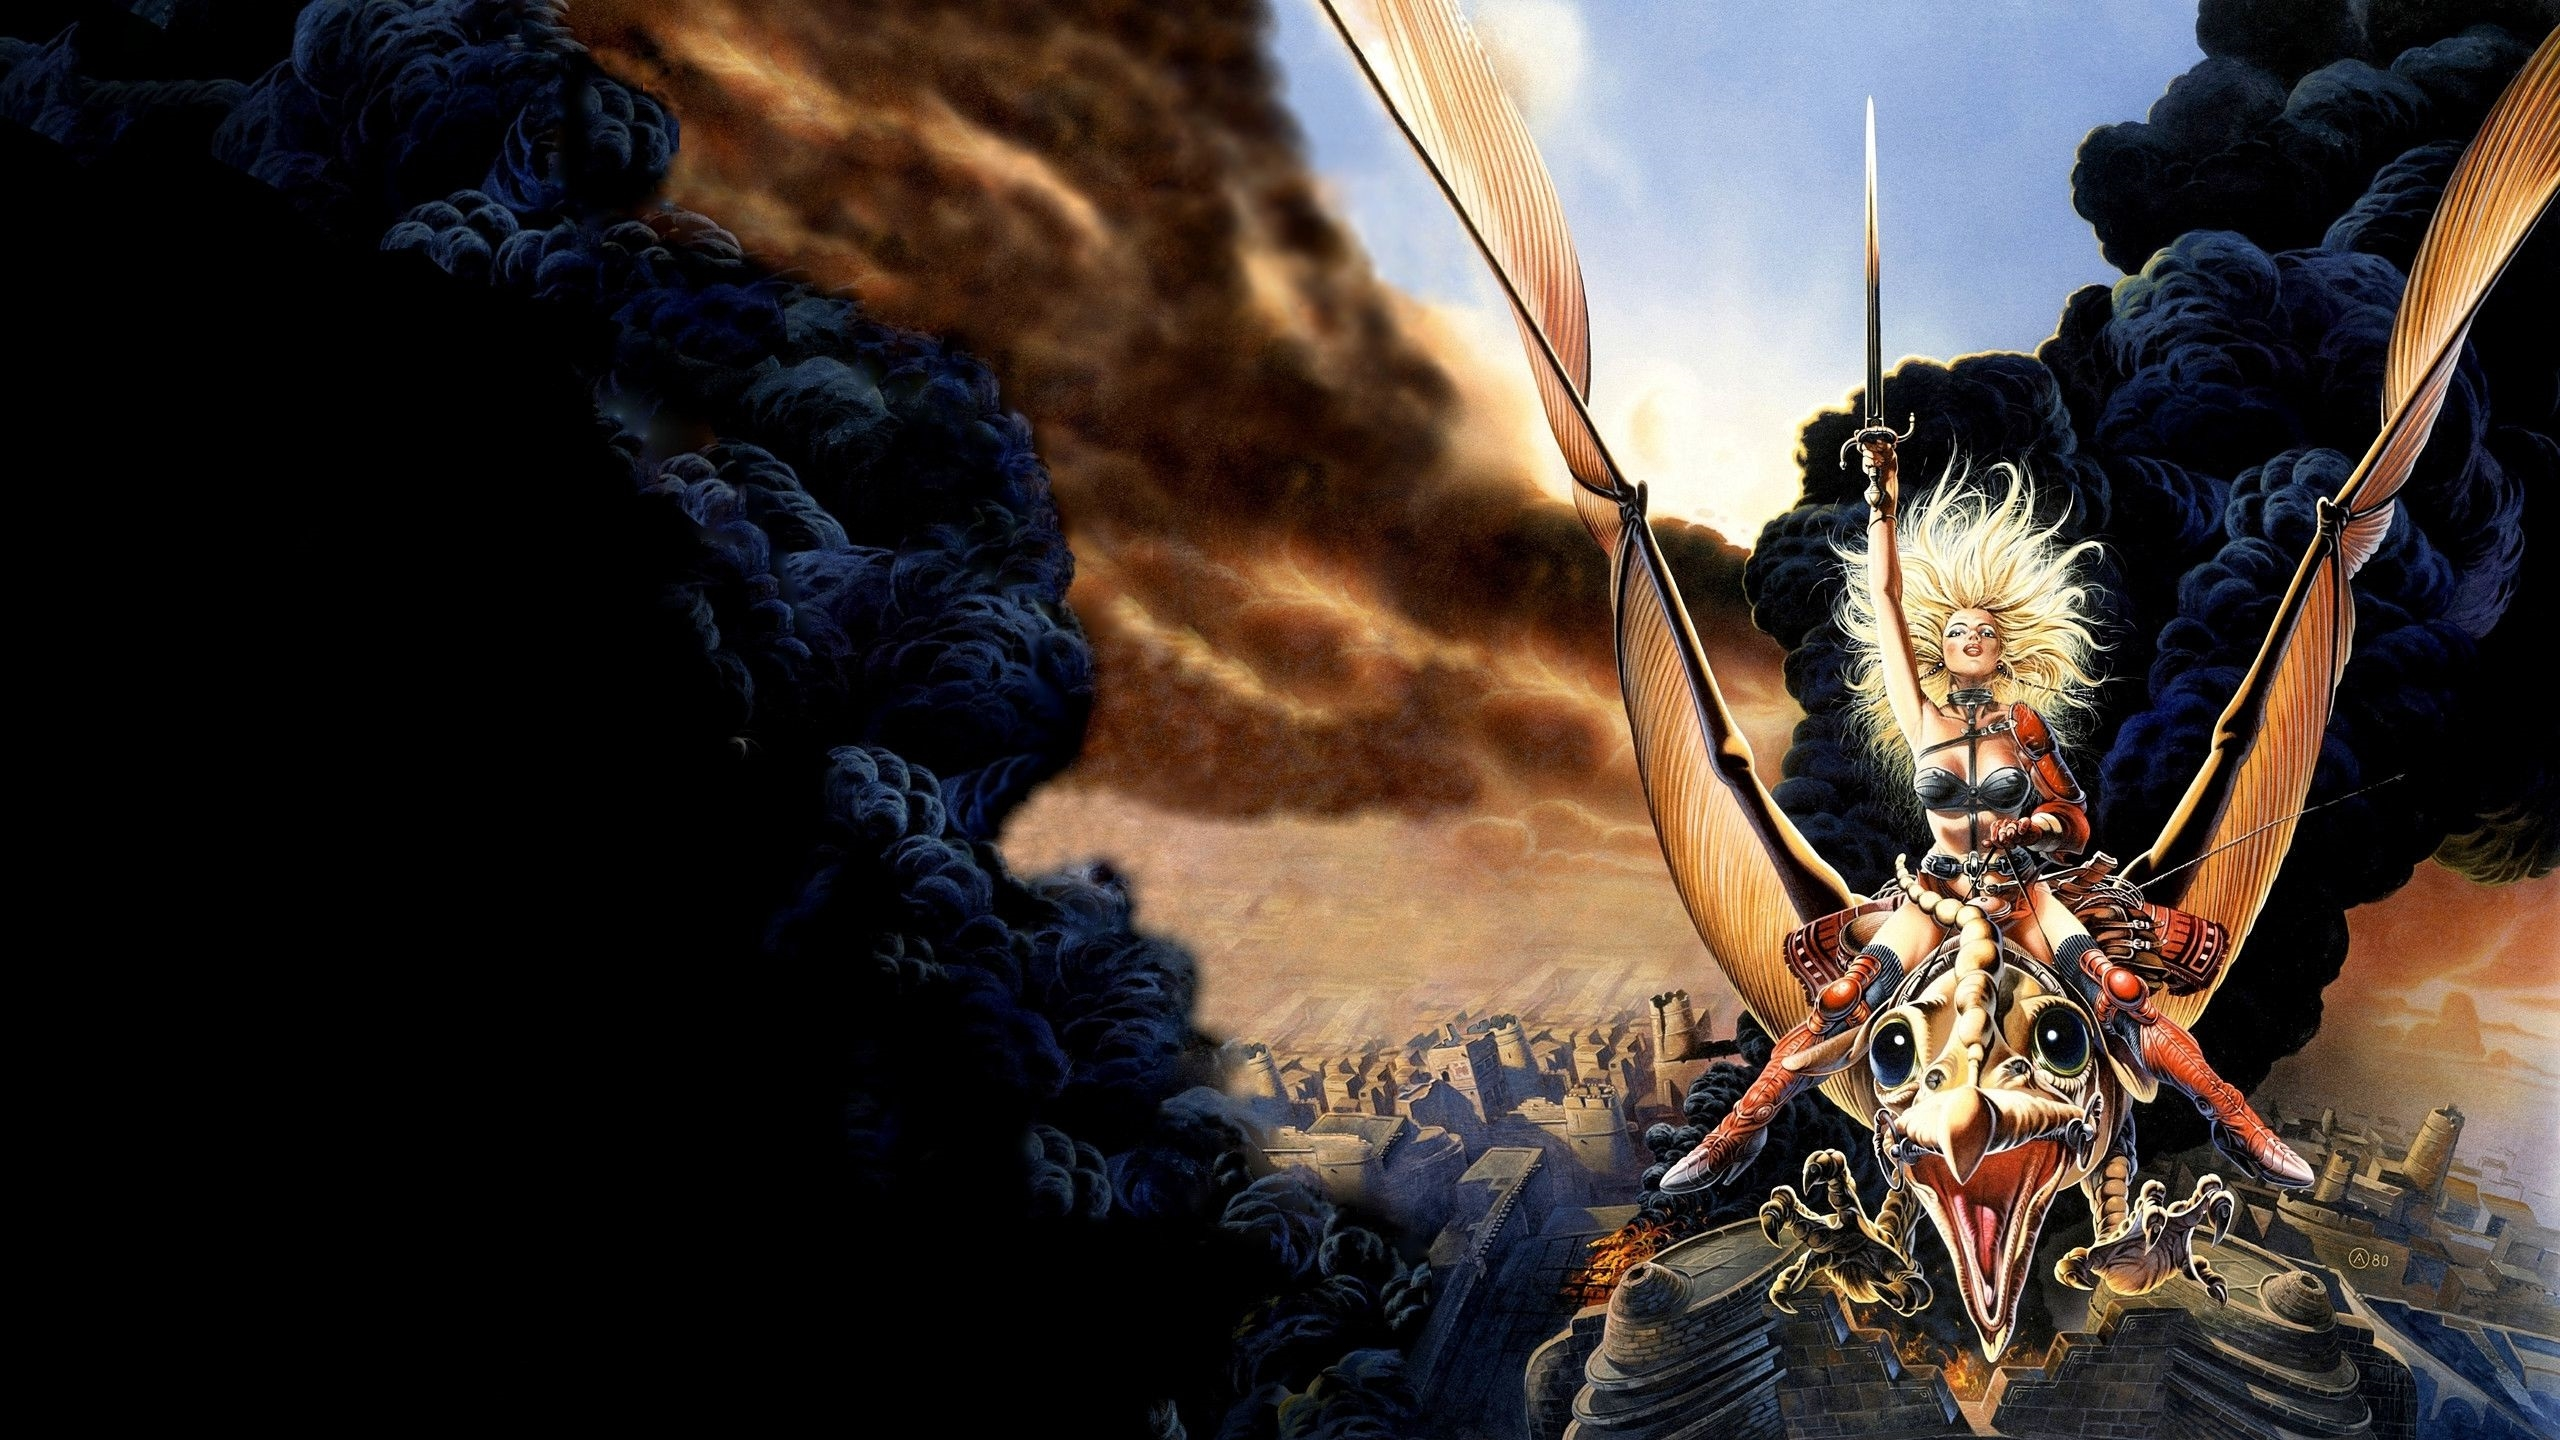 Heavy Metal HD Wallpaper   Background Image   2560x1440 ...